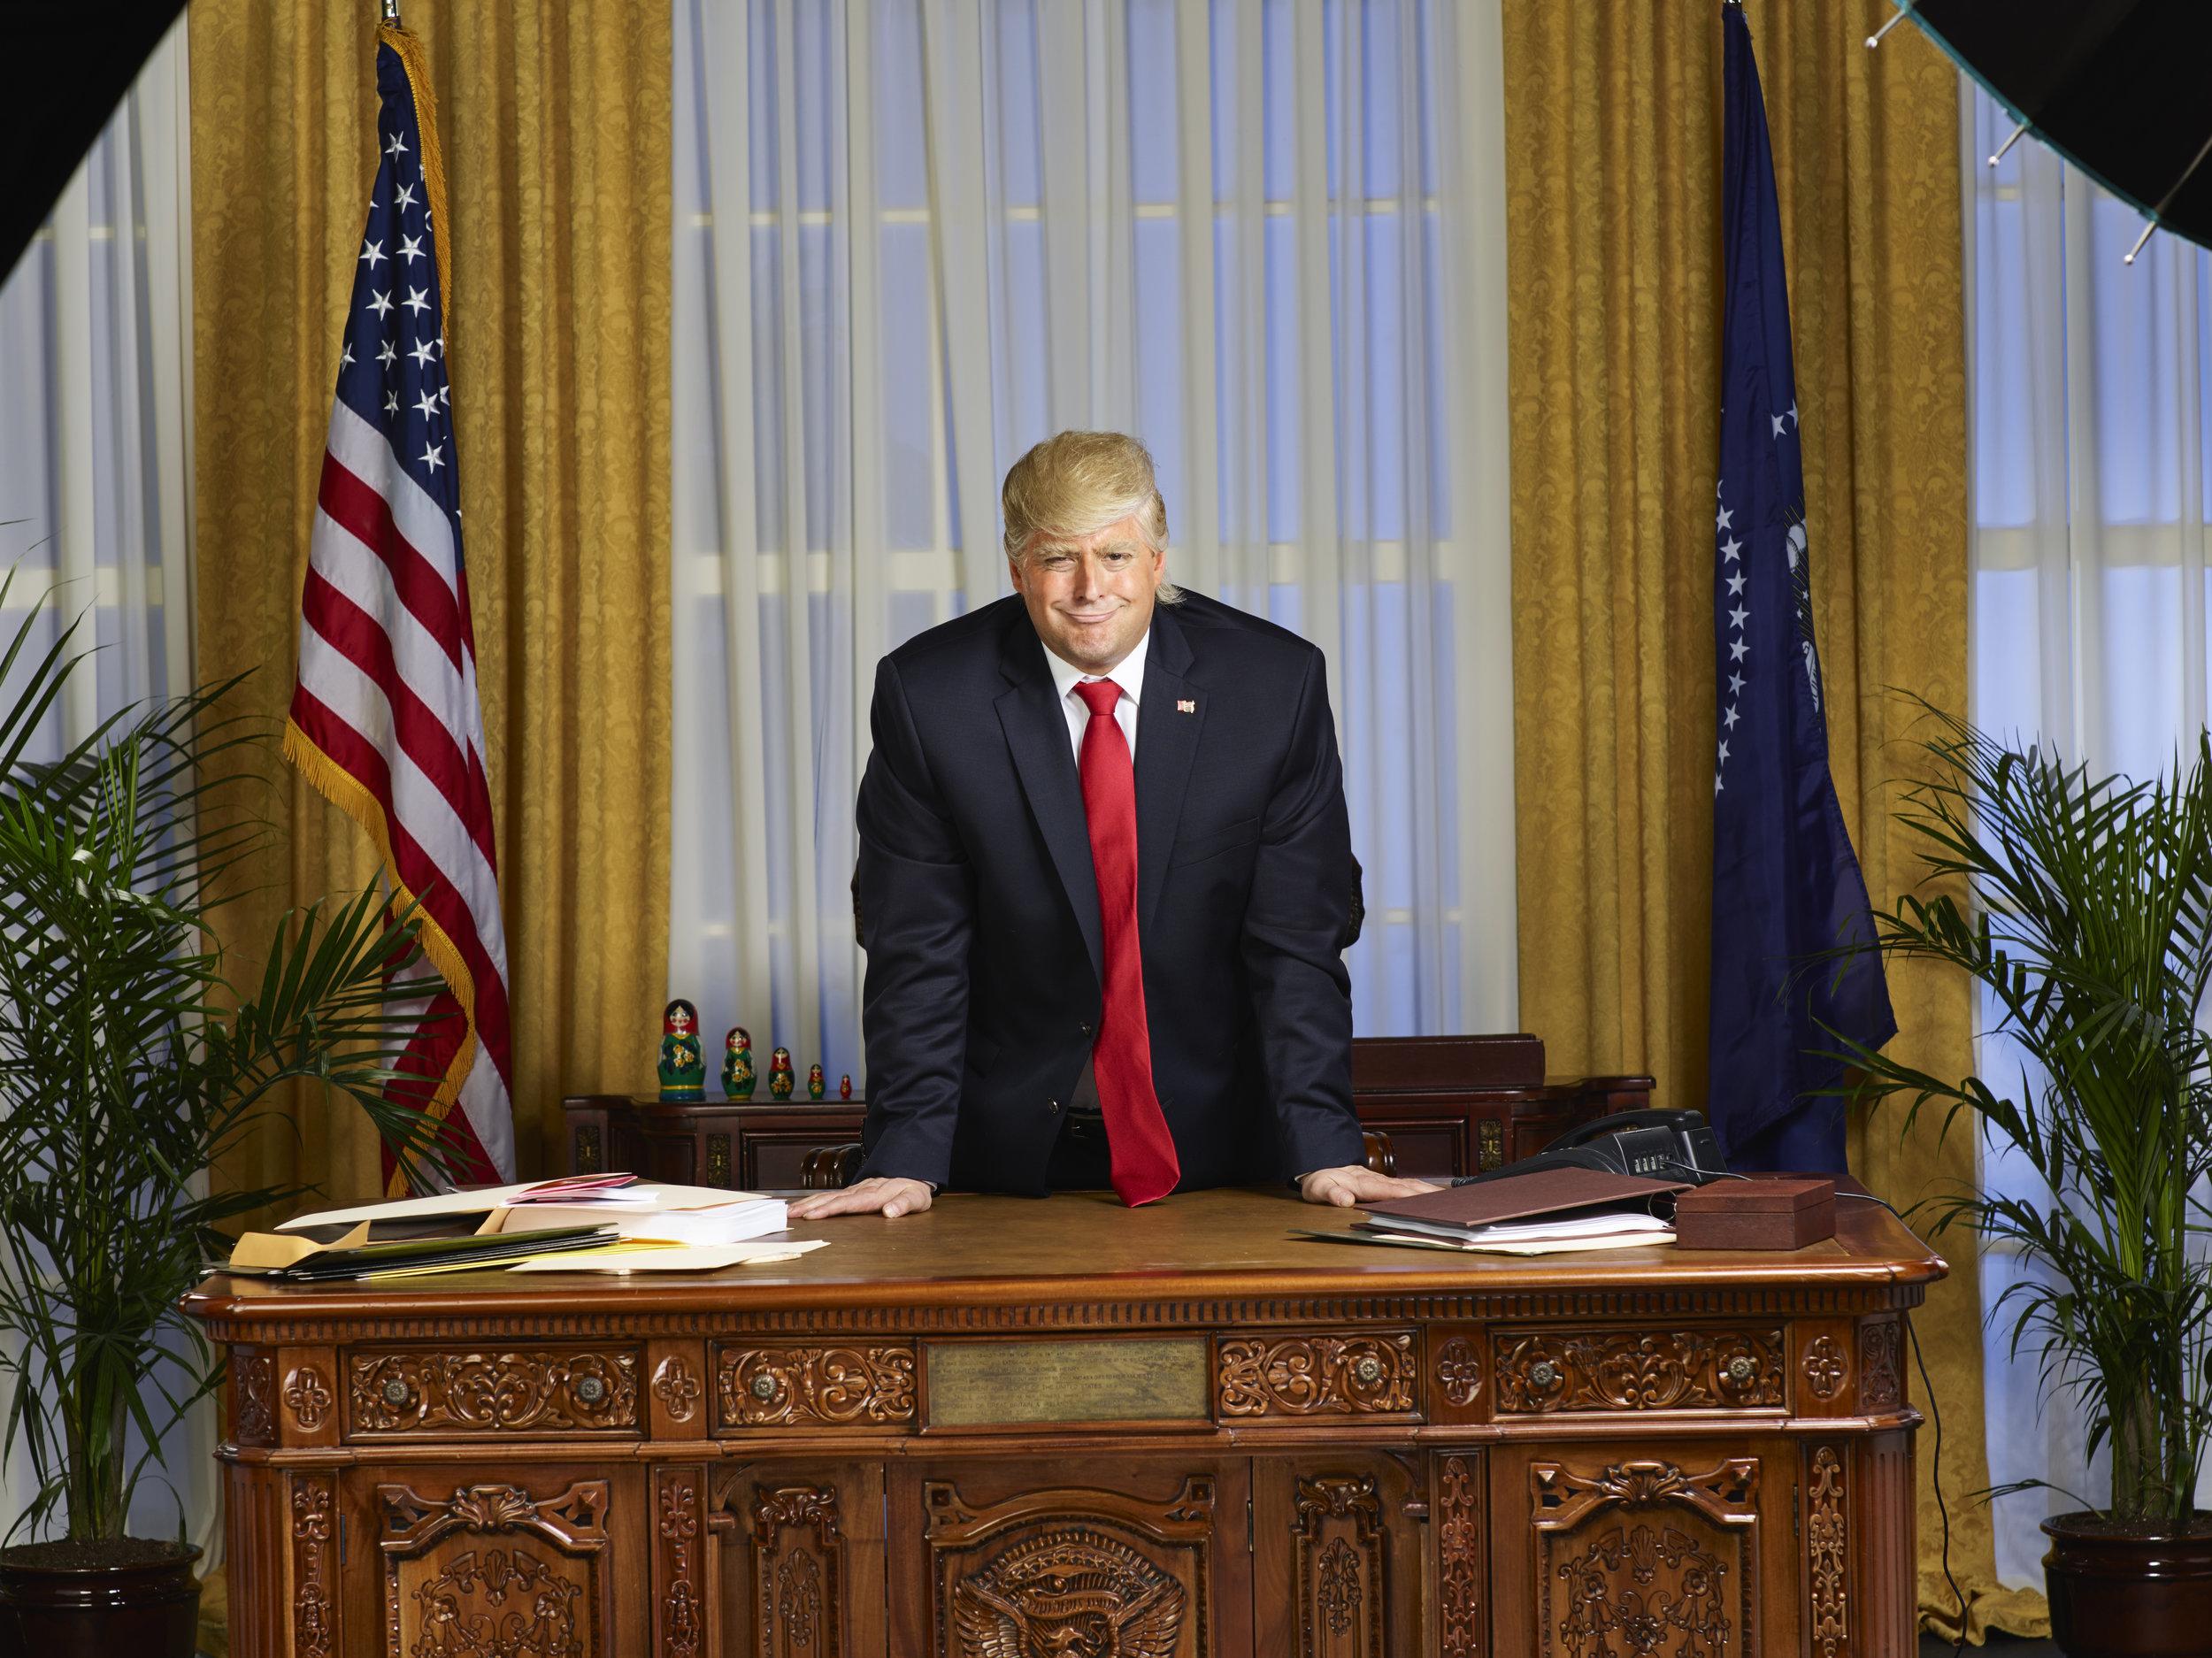 The-President-Show-S1-Oval-Office_0248.jpg